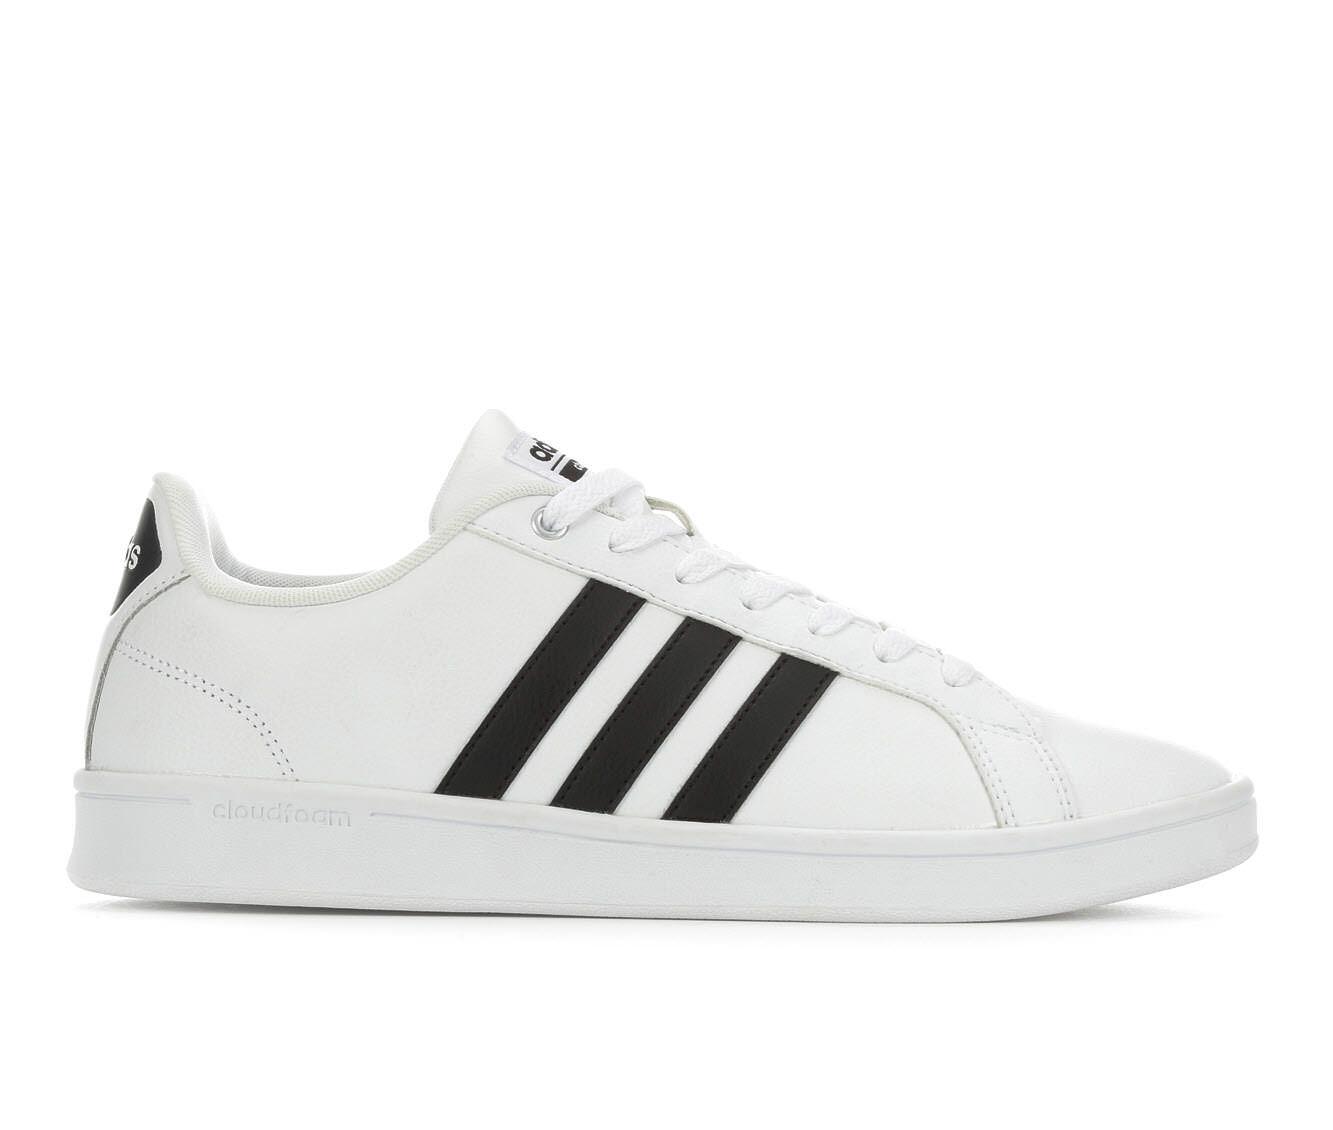 889772338463 UPC - Adidas Neo Men's Cloudfoam Advantage Fashion ...